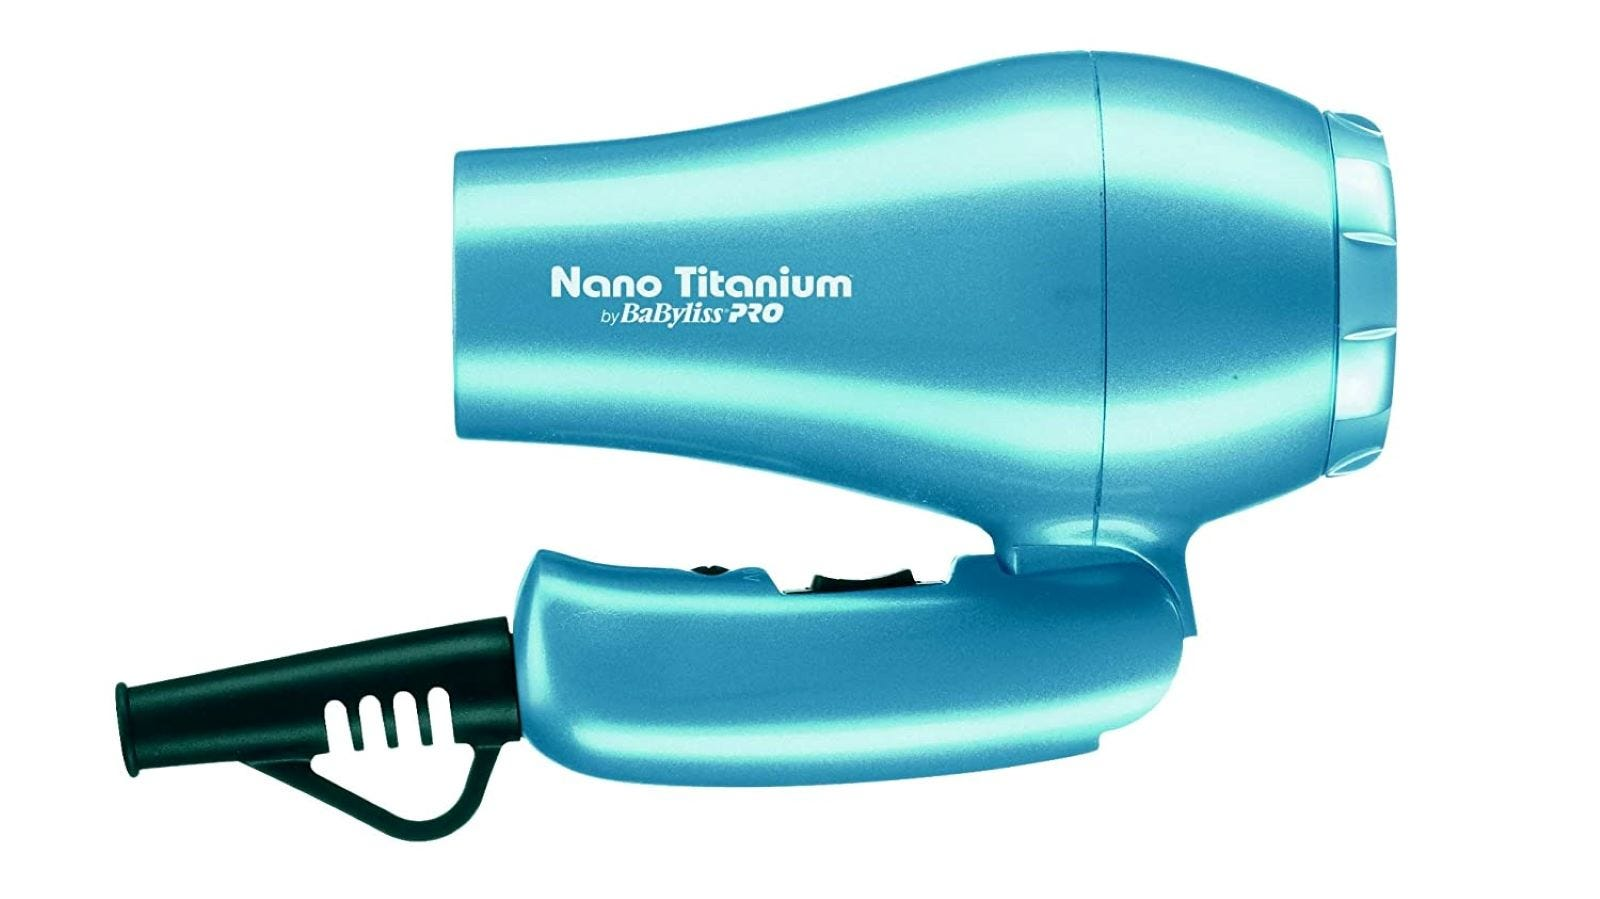 BaBylissPRO Nano Titanium foldable Travel Hair Dryer.